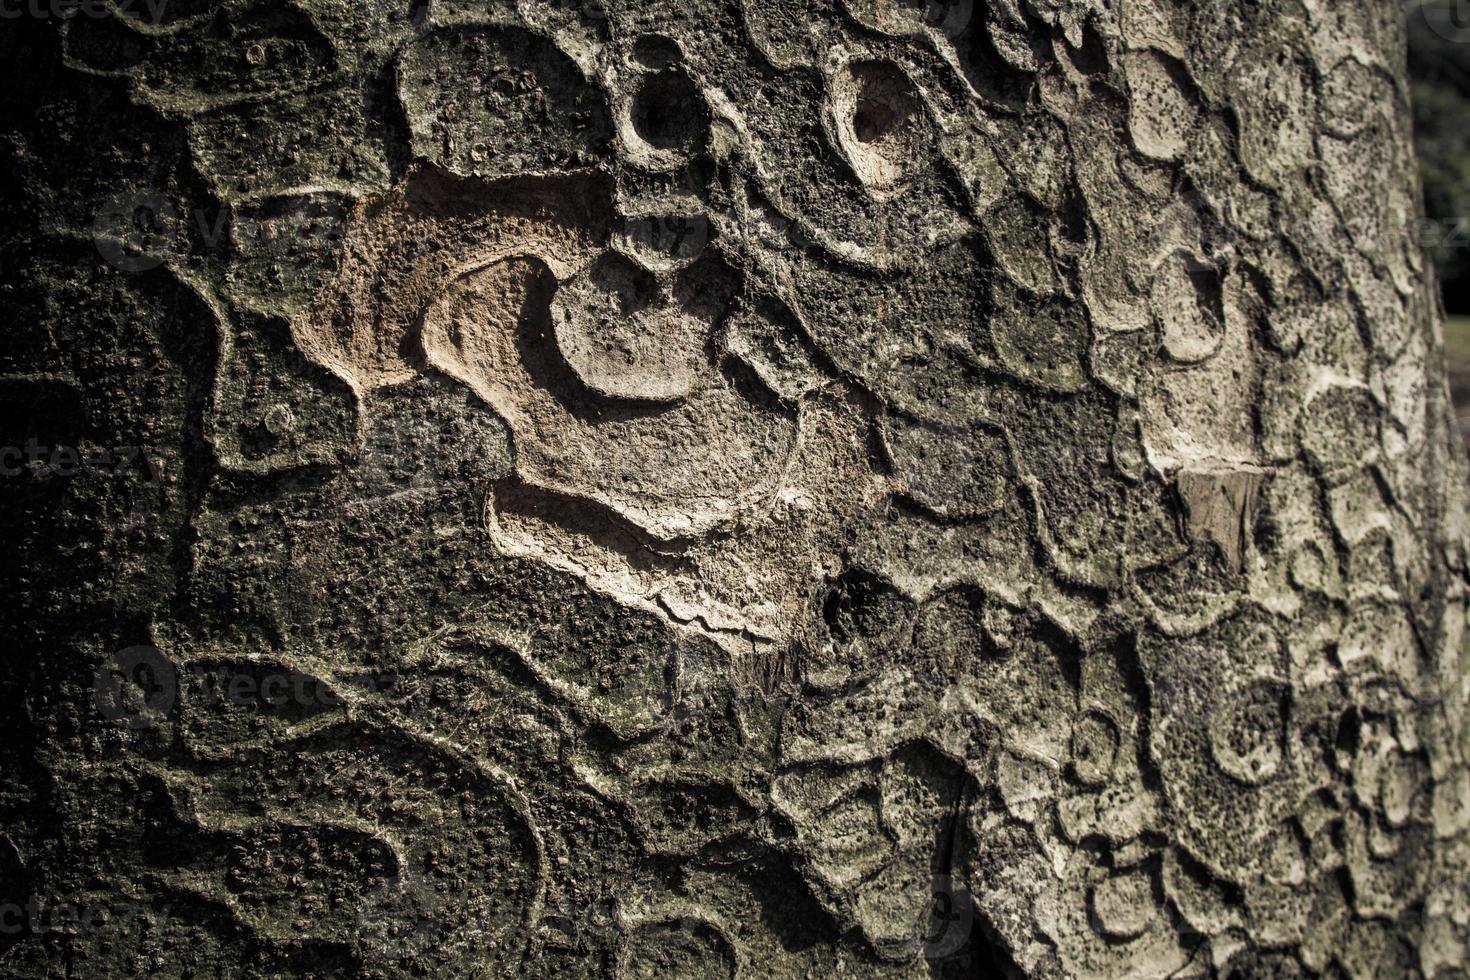 träd bark närbild foto